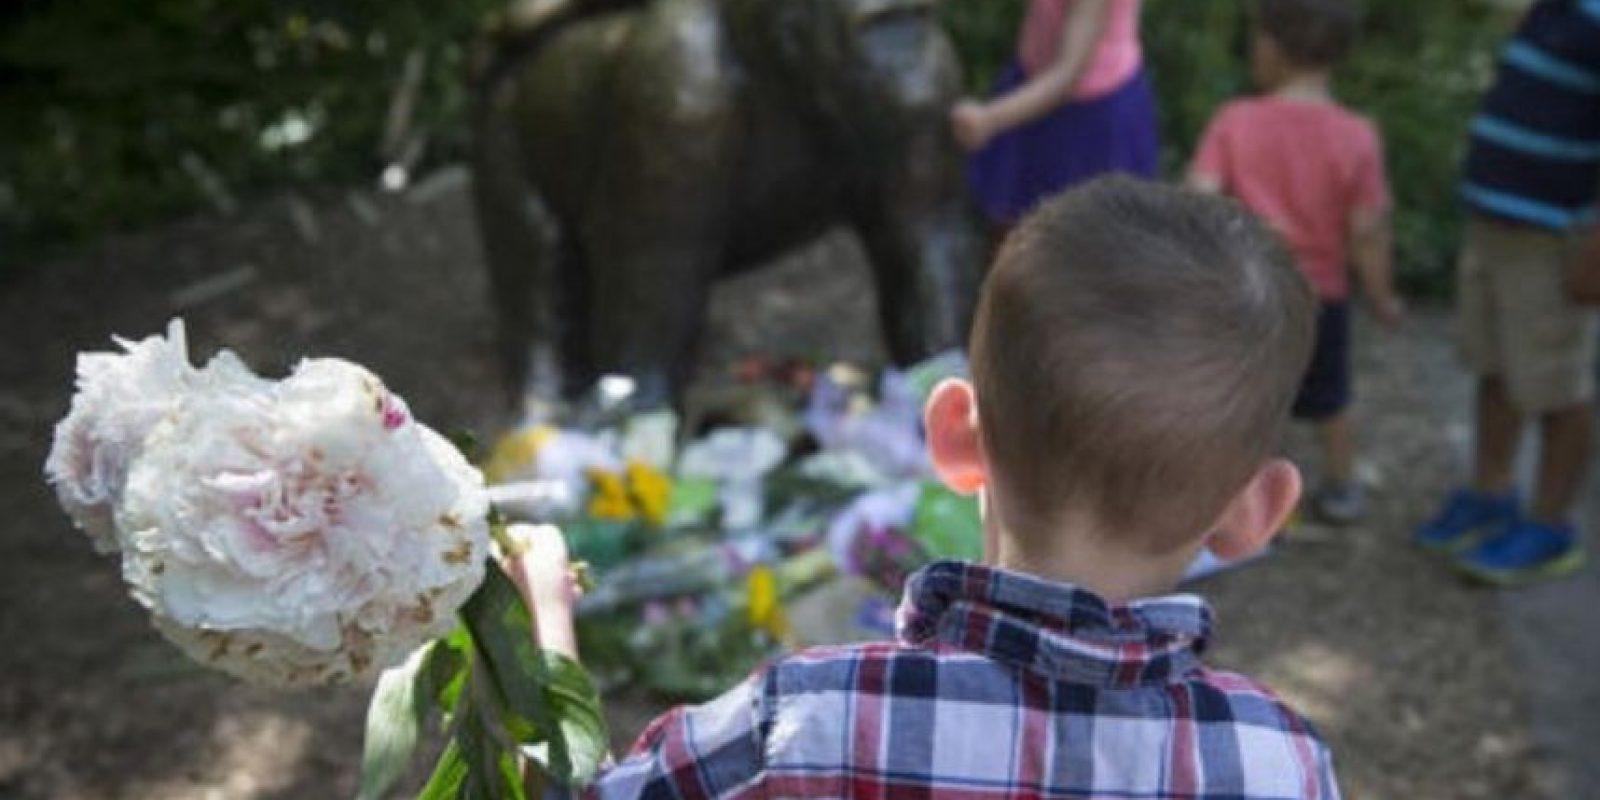 """No culpen a los padres"", la carta que se vuelve viral en redes Foto:Getty Images"